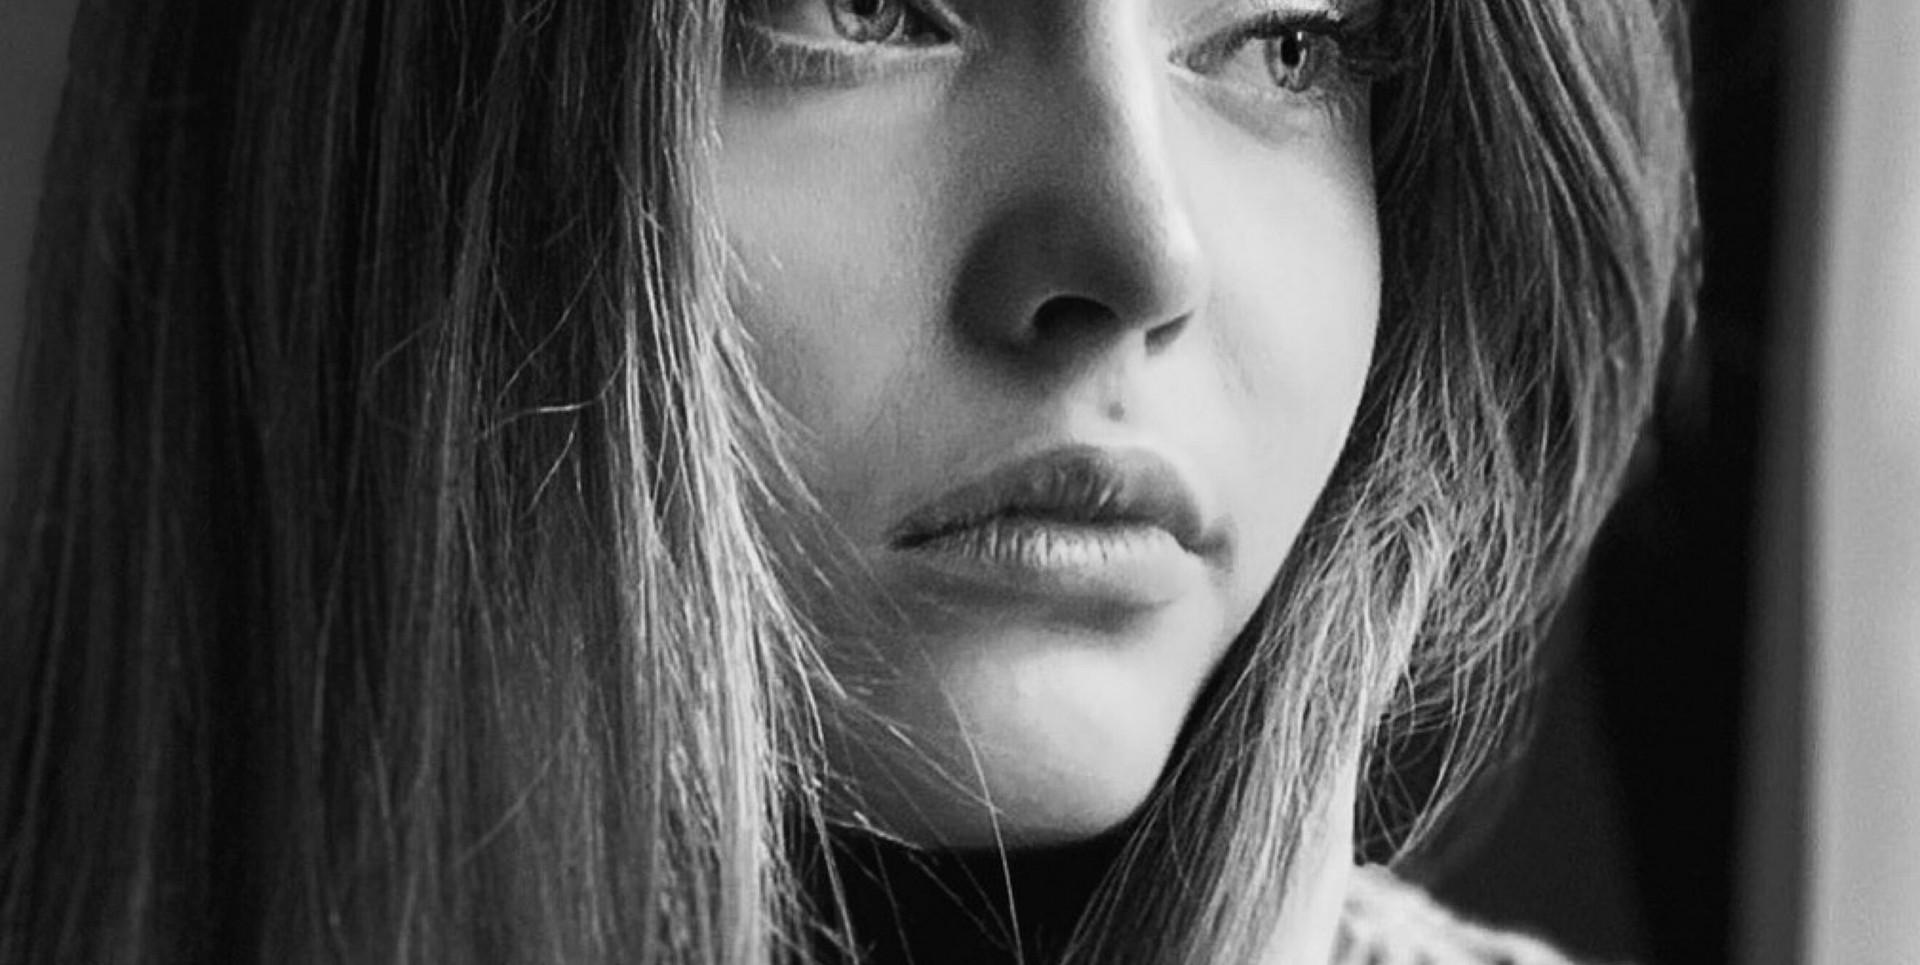 Irina Timonina